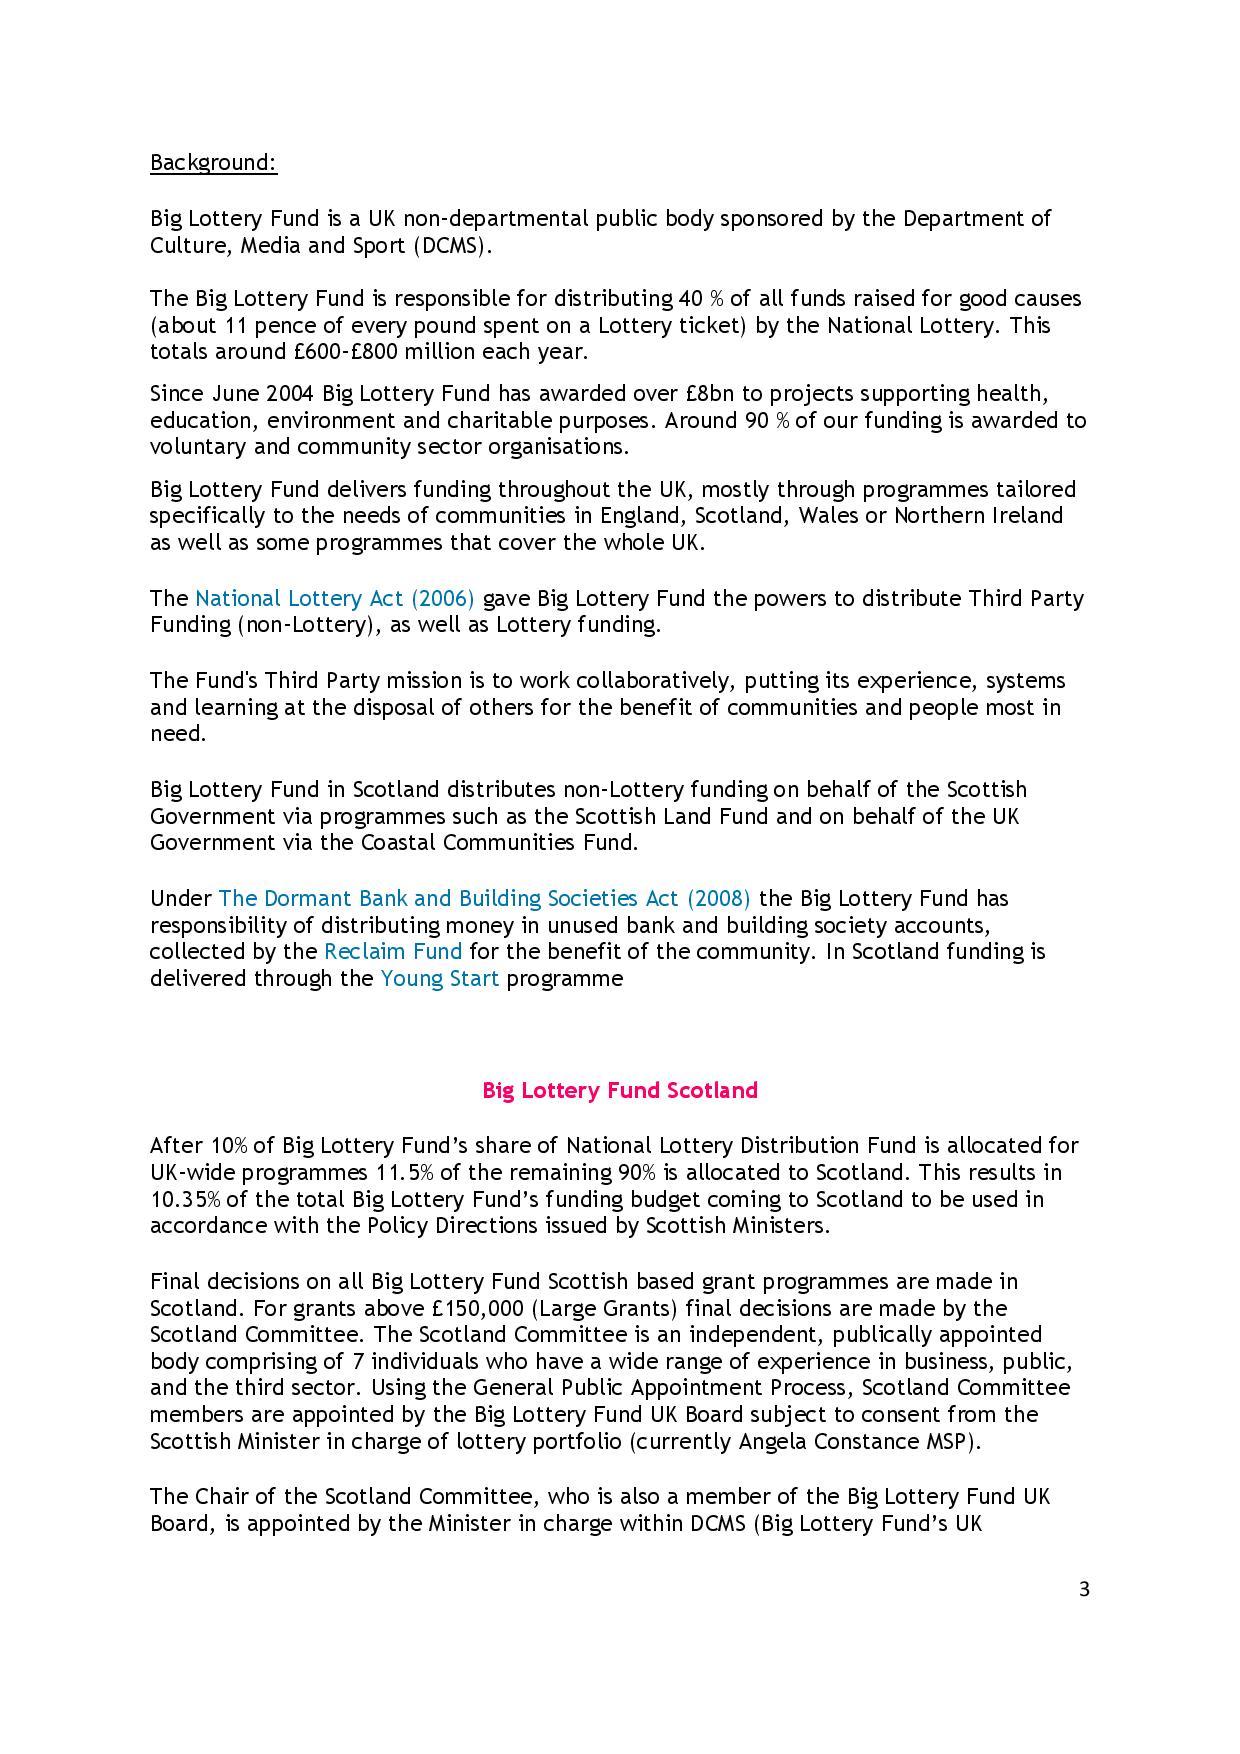 Big_Lottery_Fund_Scotland_Information_Briefing-page-003.jpg